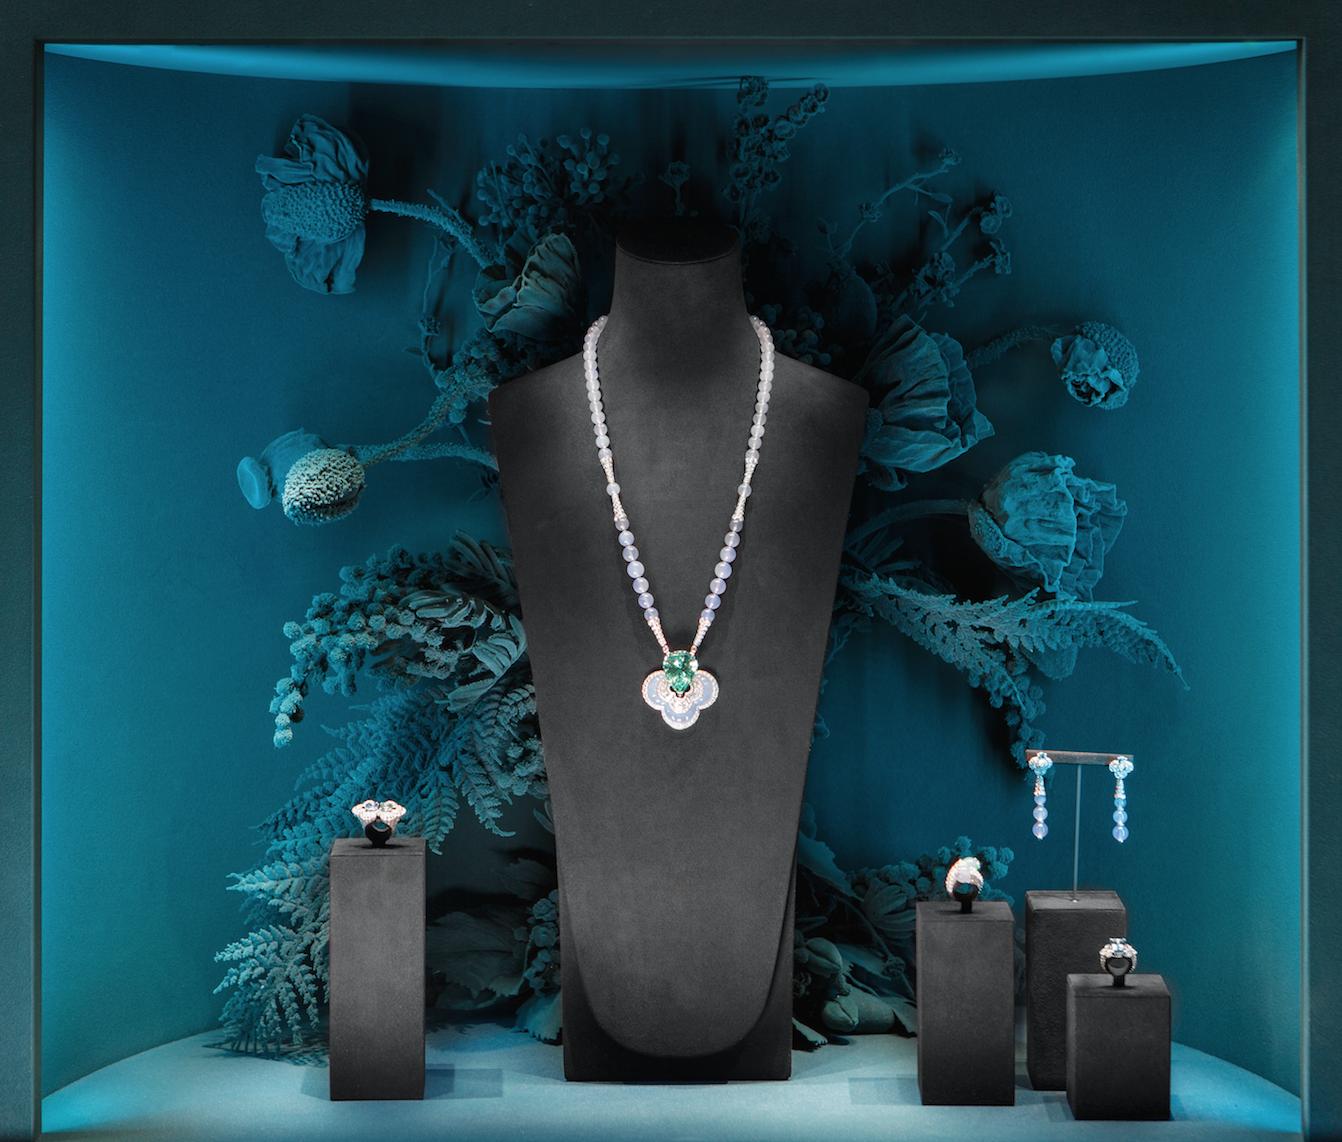 Louis Vuitton Blossom high jewellery 2016